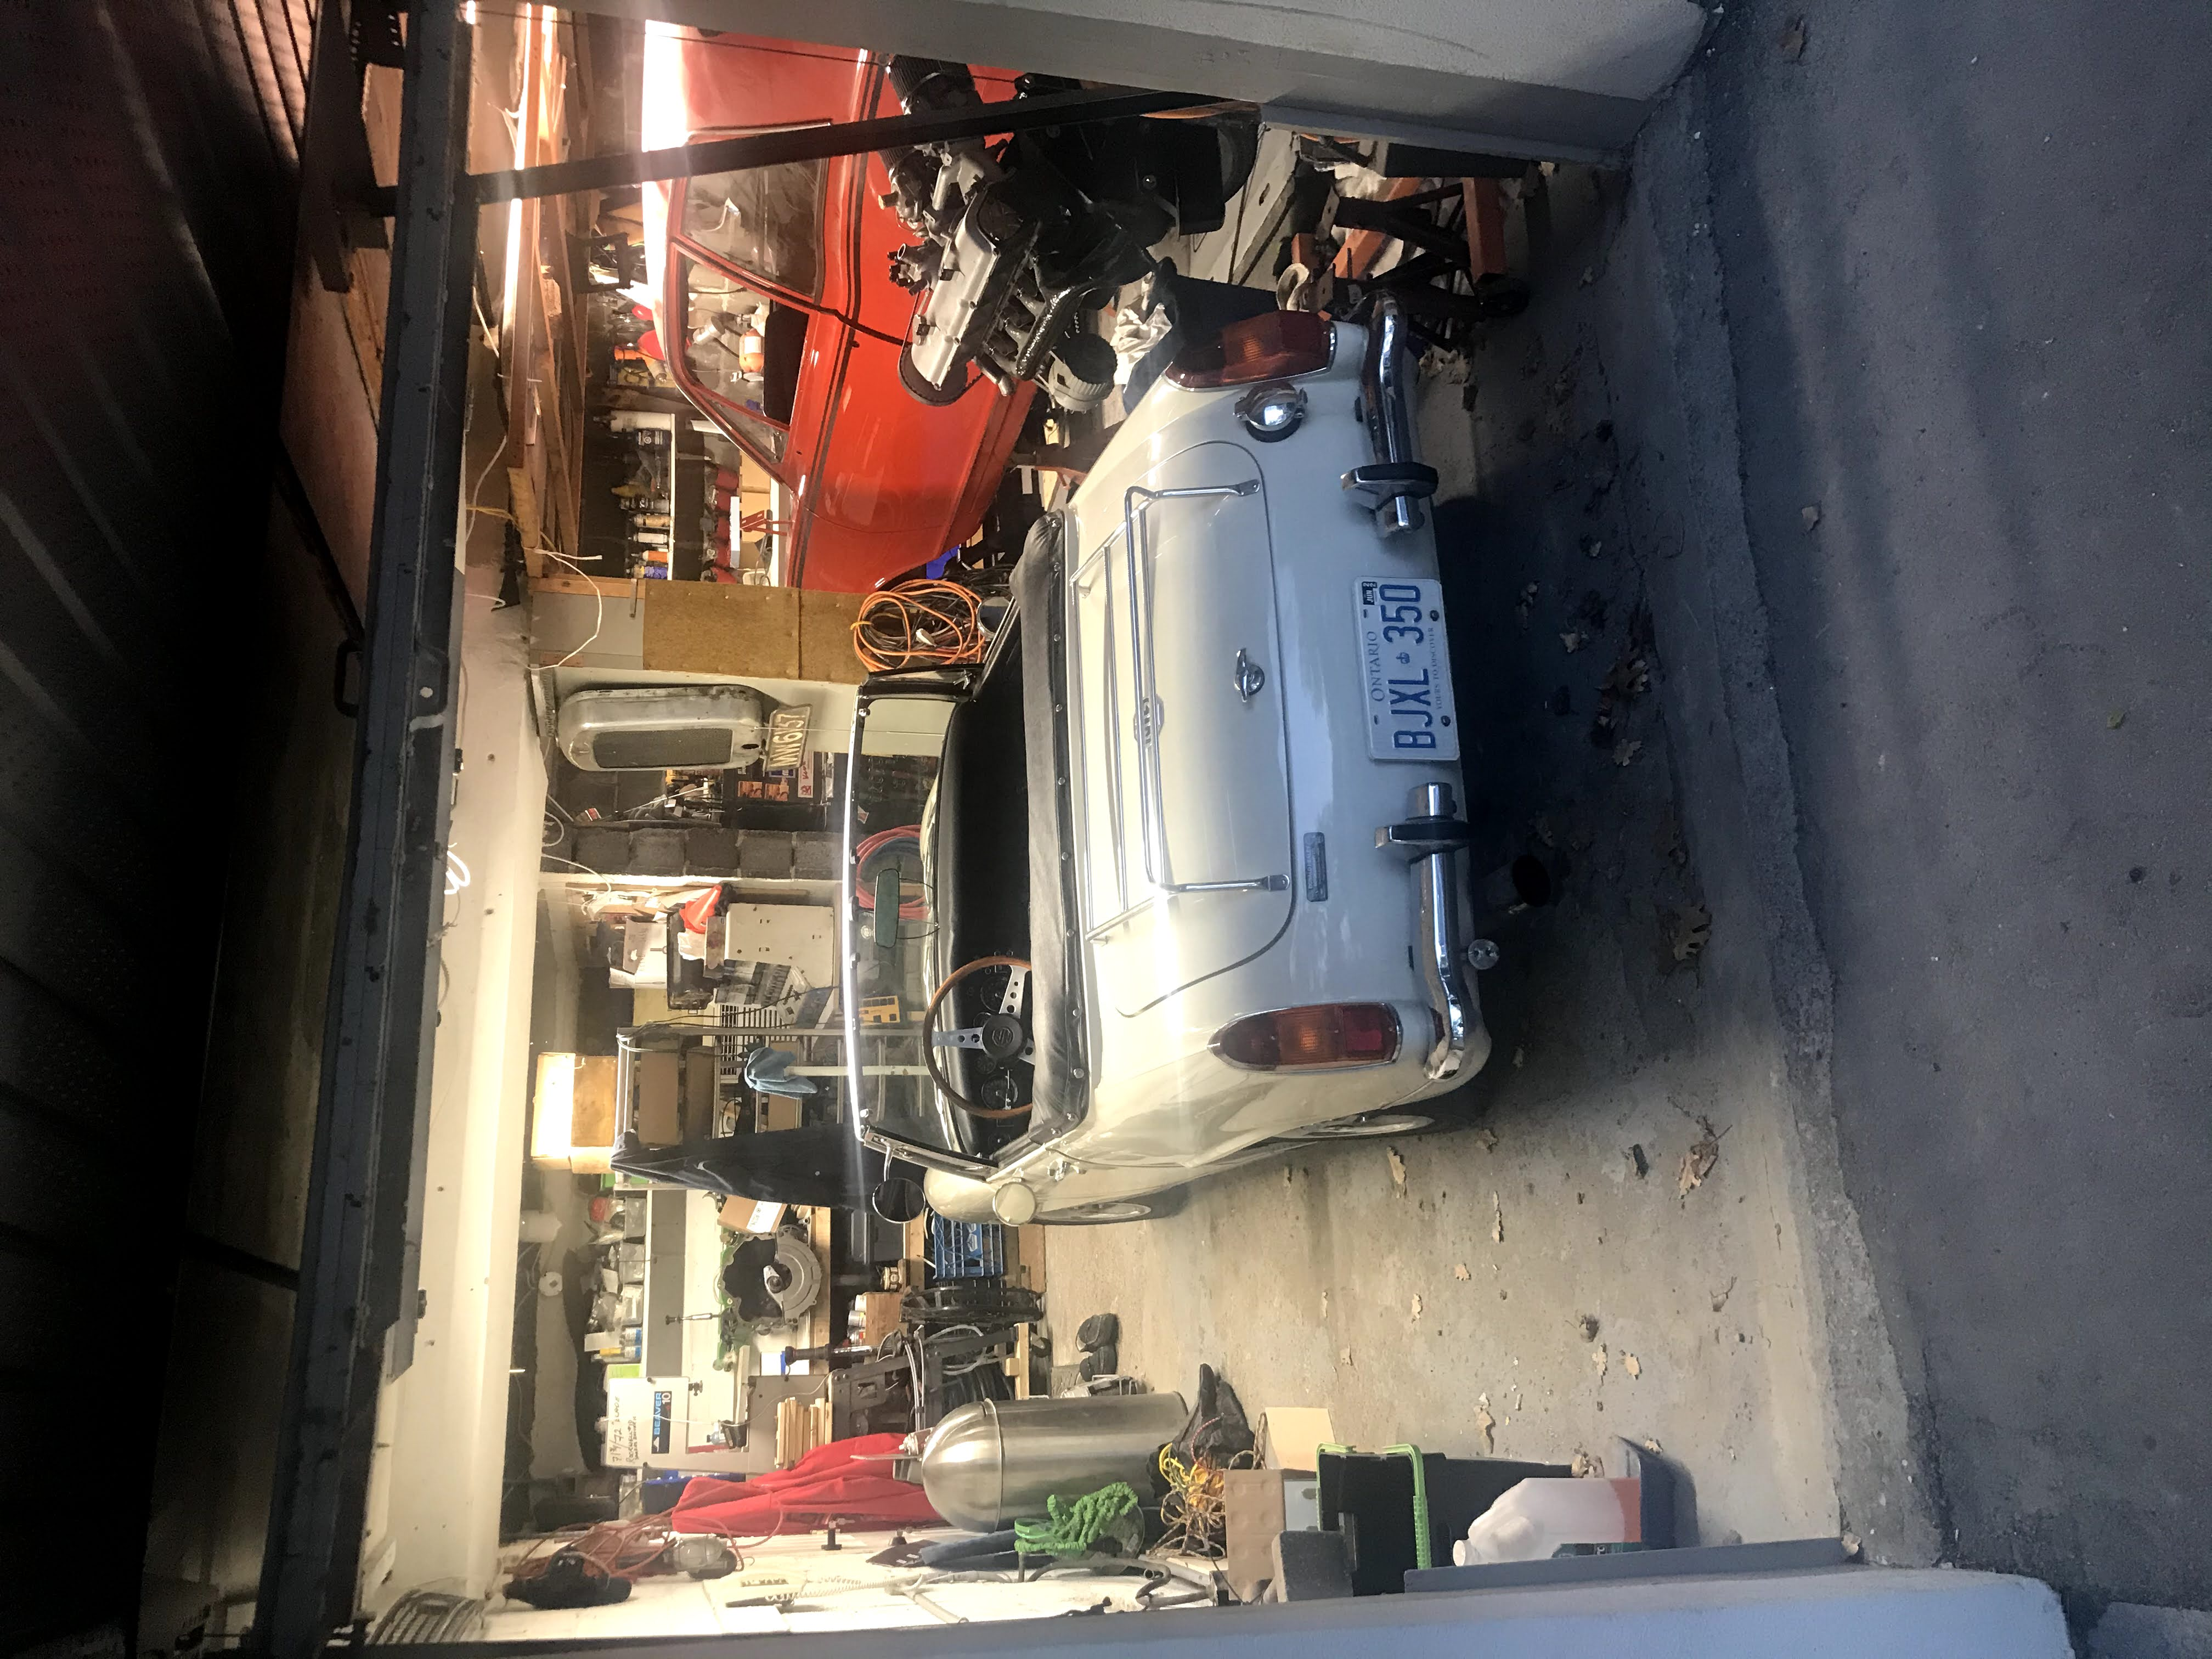 MH in garage.jpg